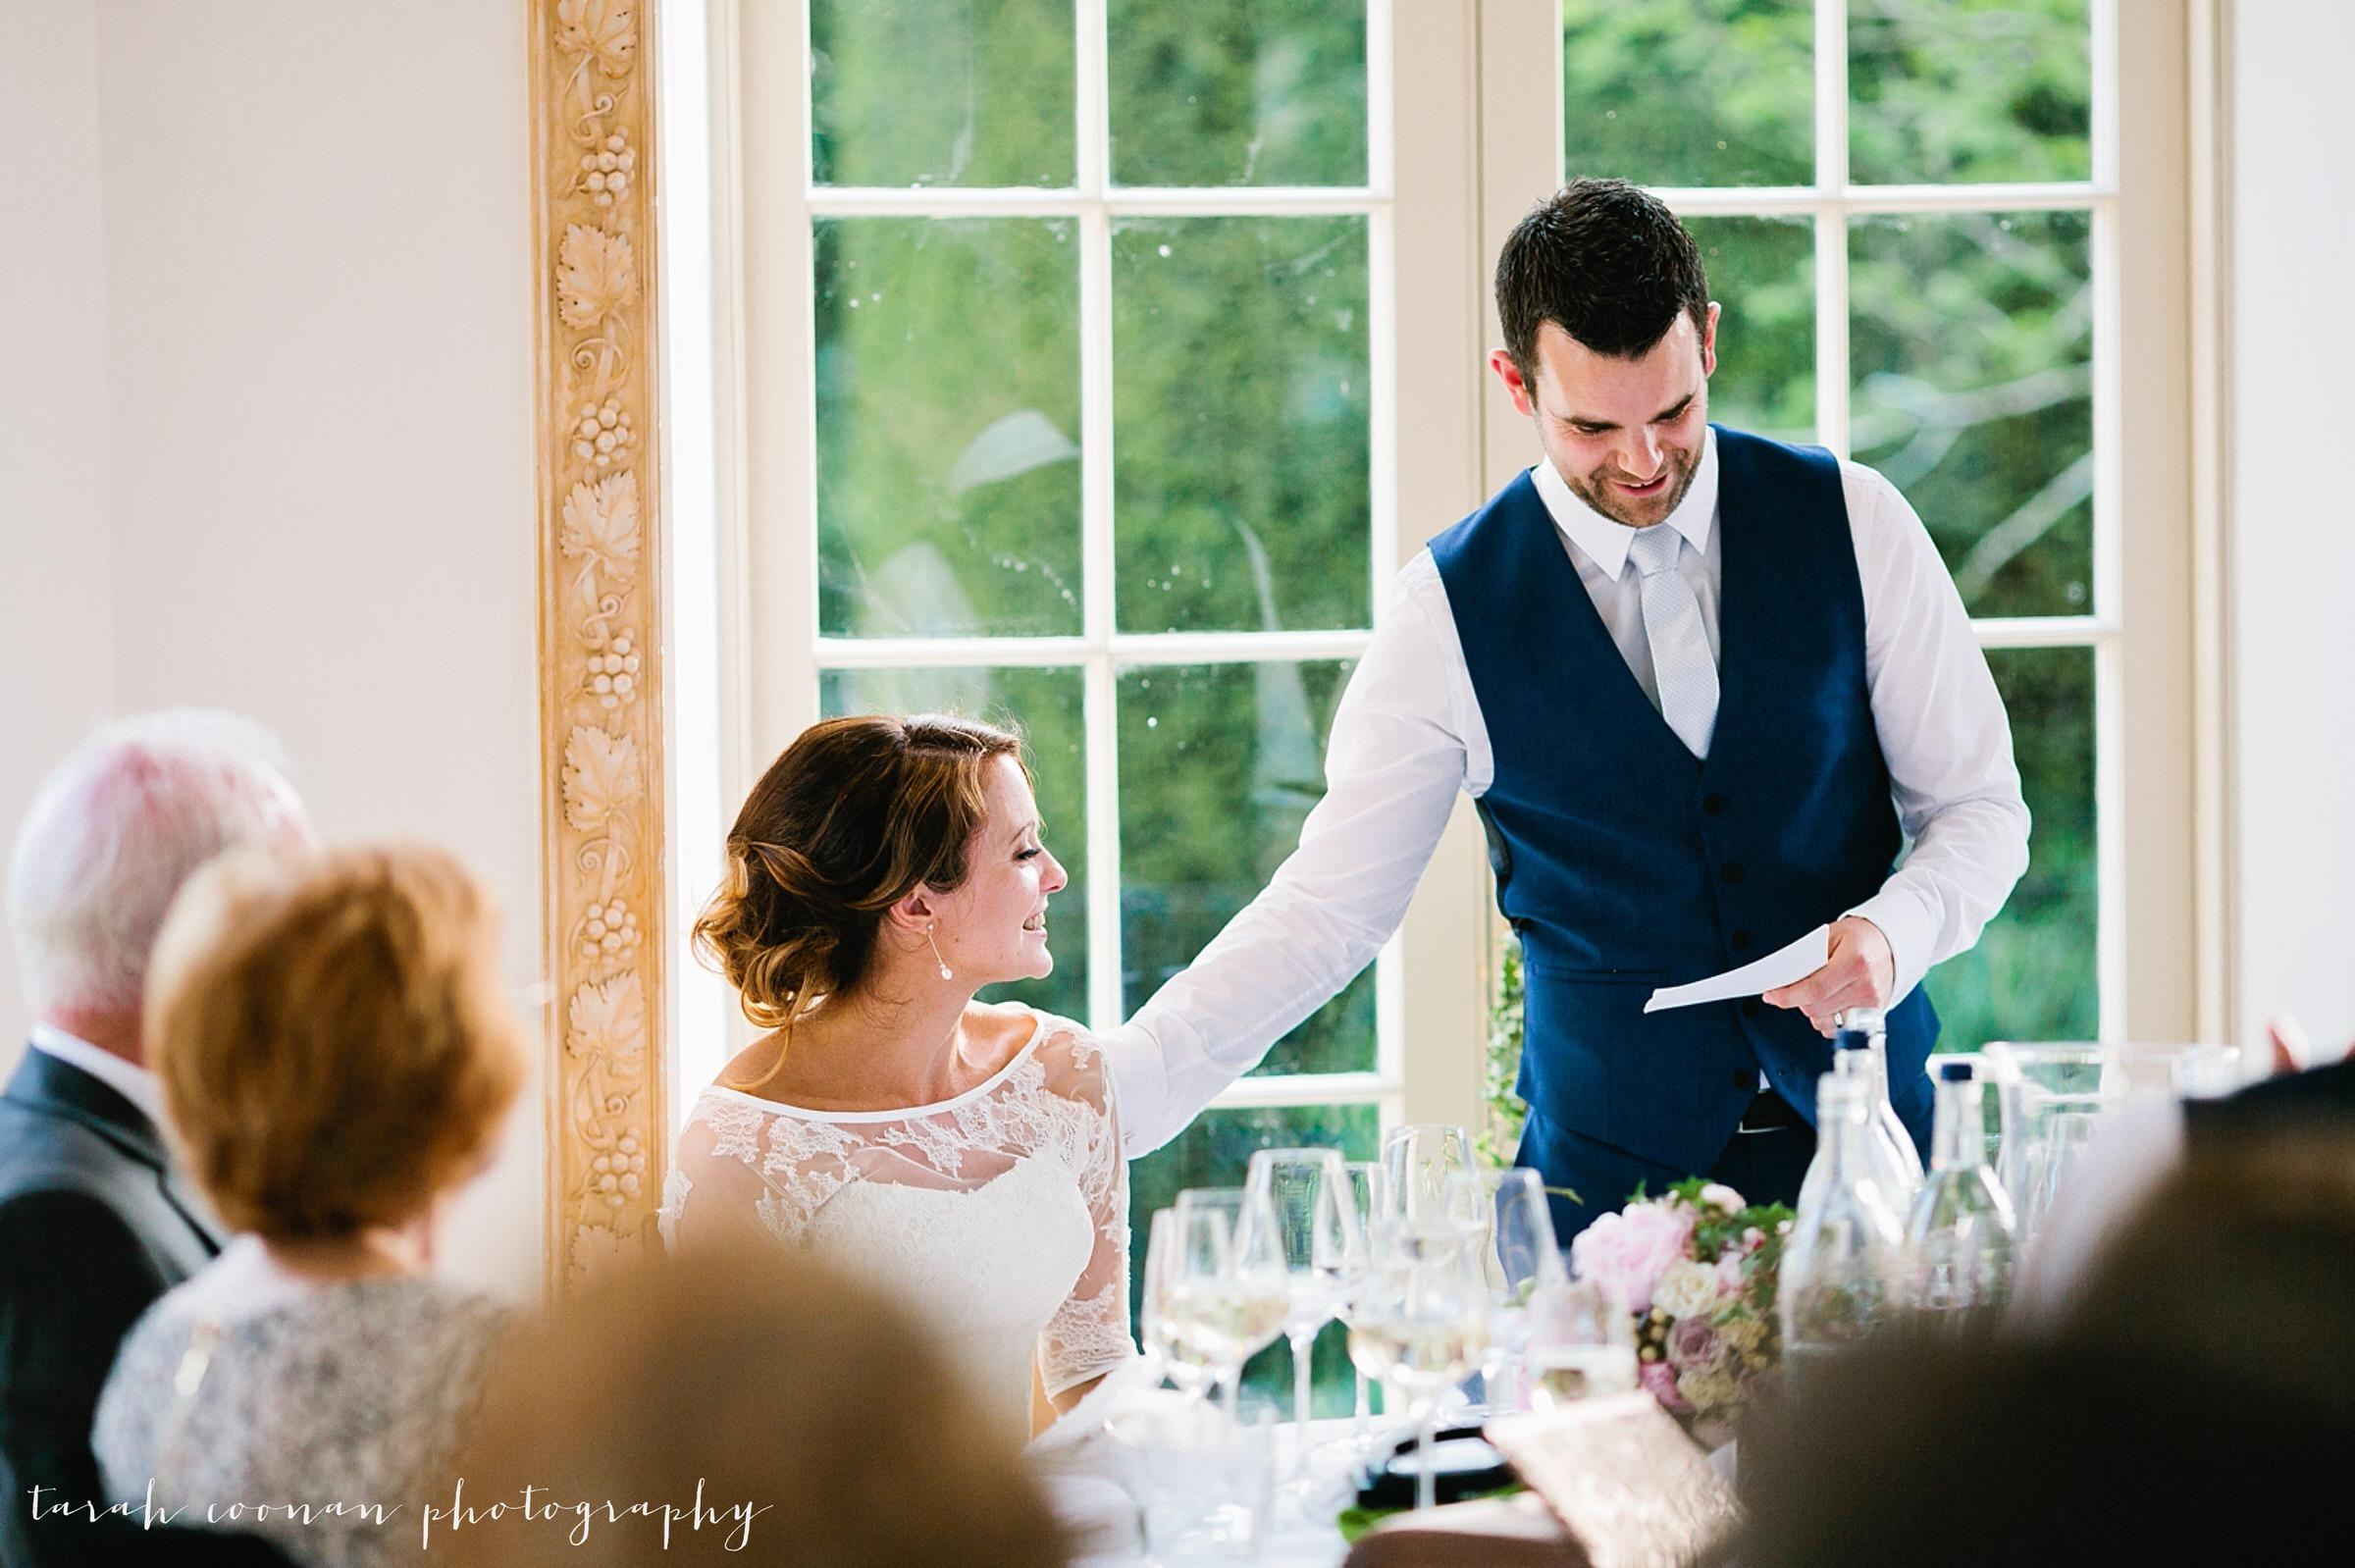 northbrook-park-wedding-photographer_074